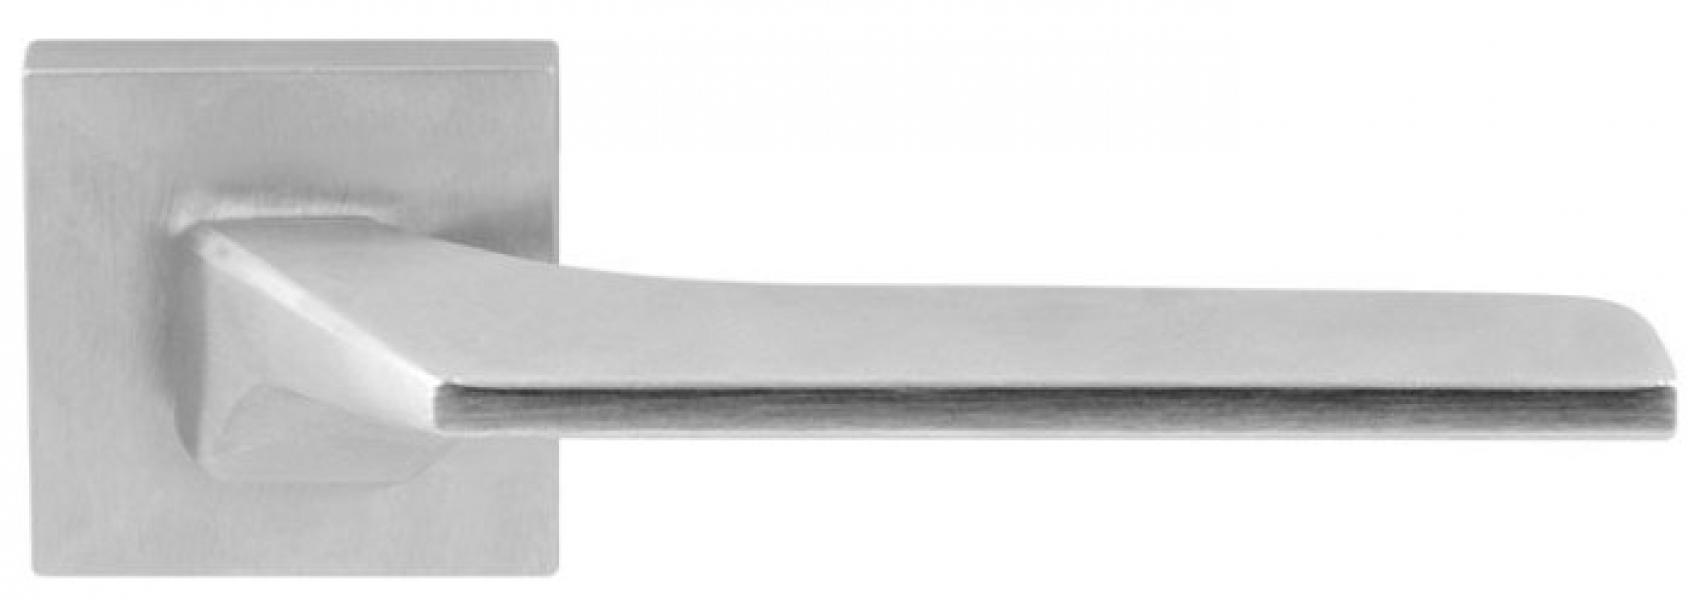 Ручка дверная на розетке Corsa H5  матовый хром